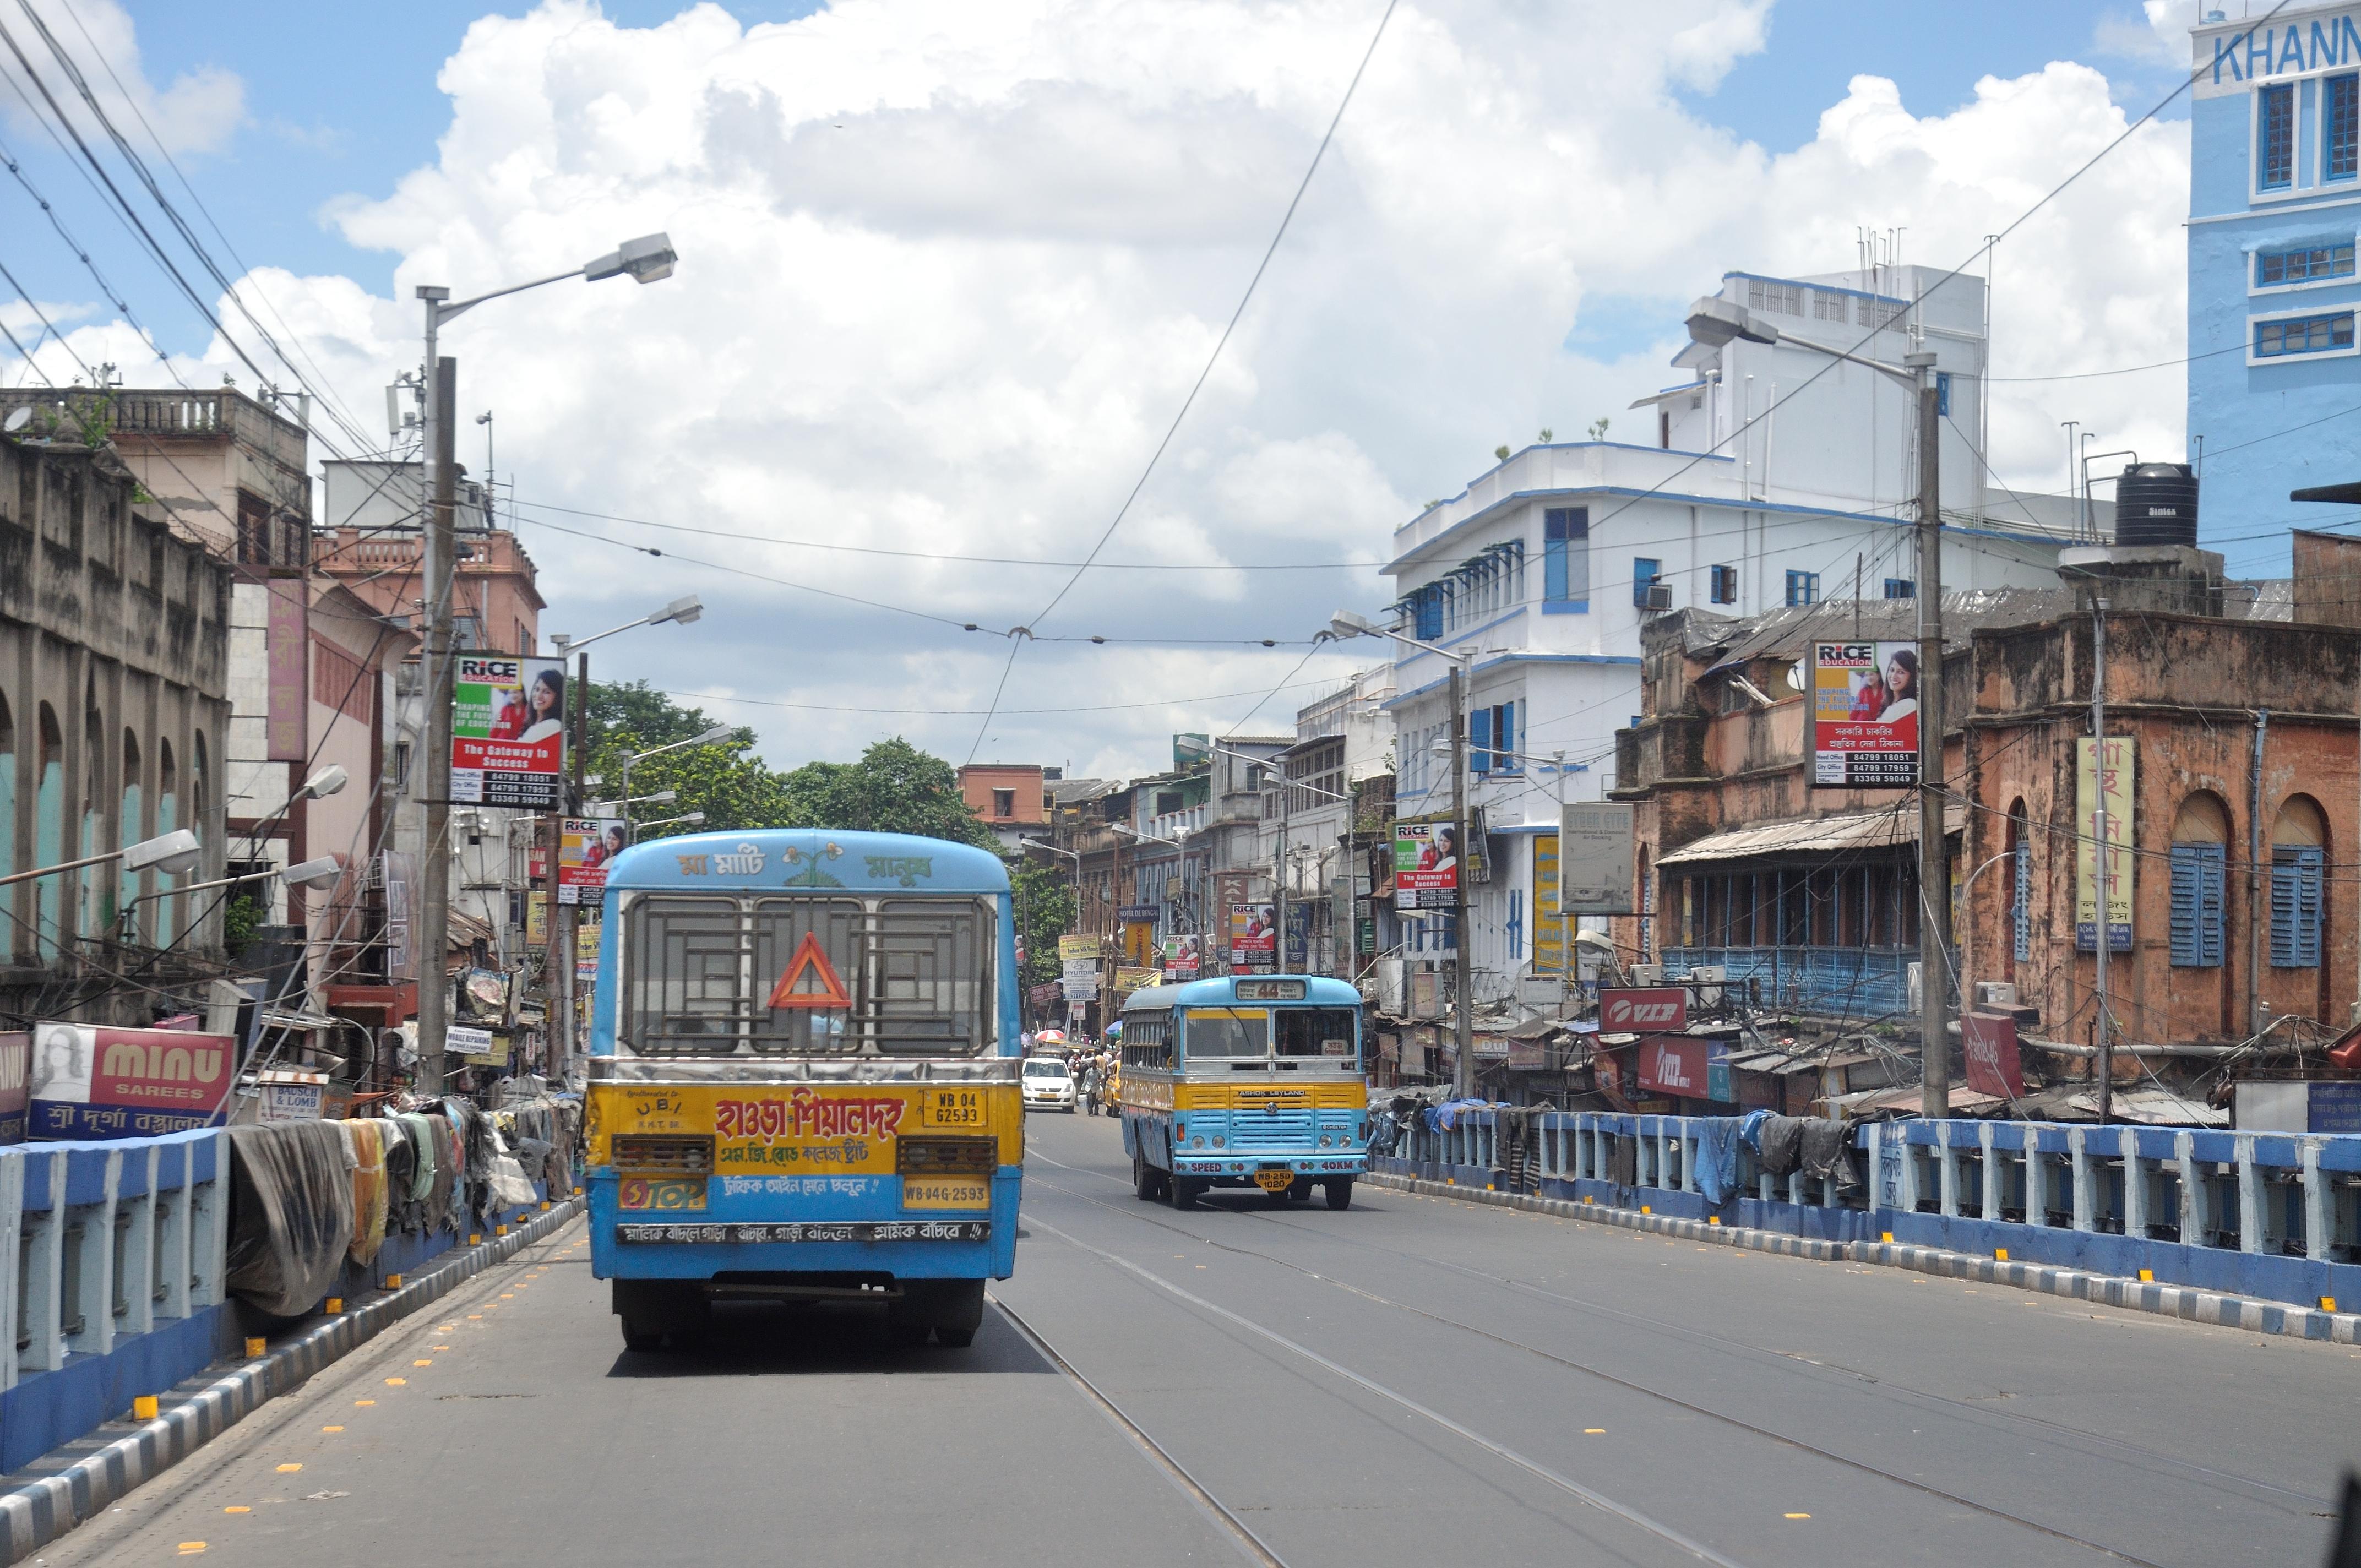 File:Vidyapati Setu - Mahatma Gandhi Road - Sealdah - Kolkata 2015-08-11  1974.JPG - Wikimedia Commons